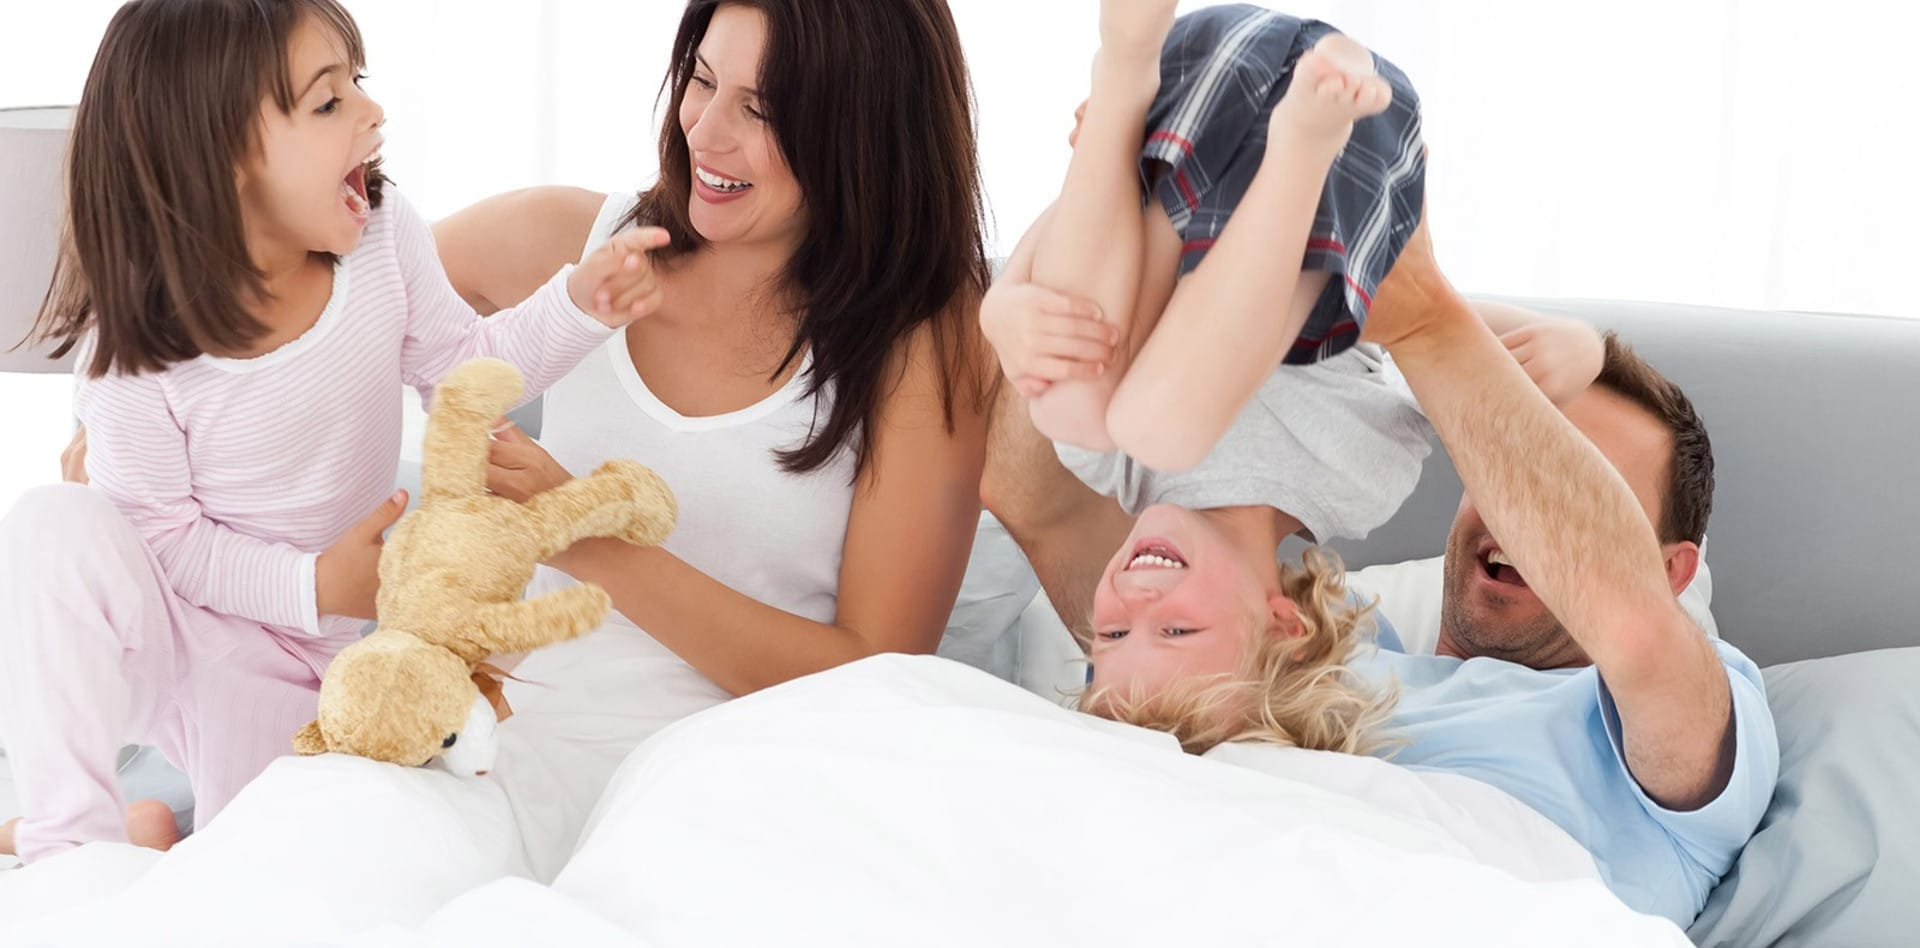 samor materassi roma slide salute benessere